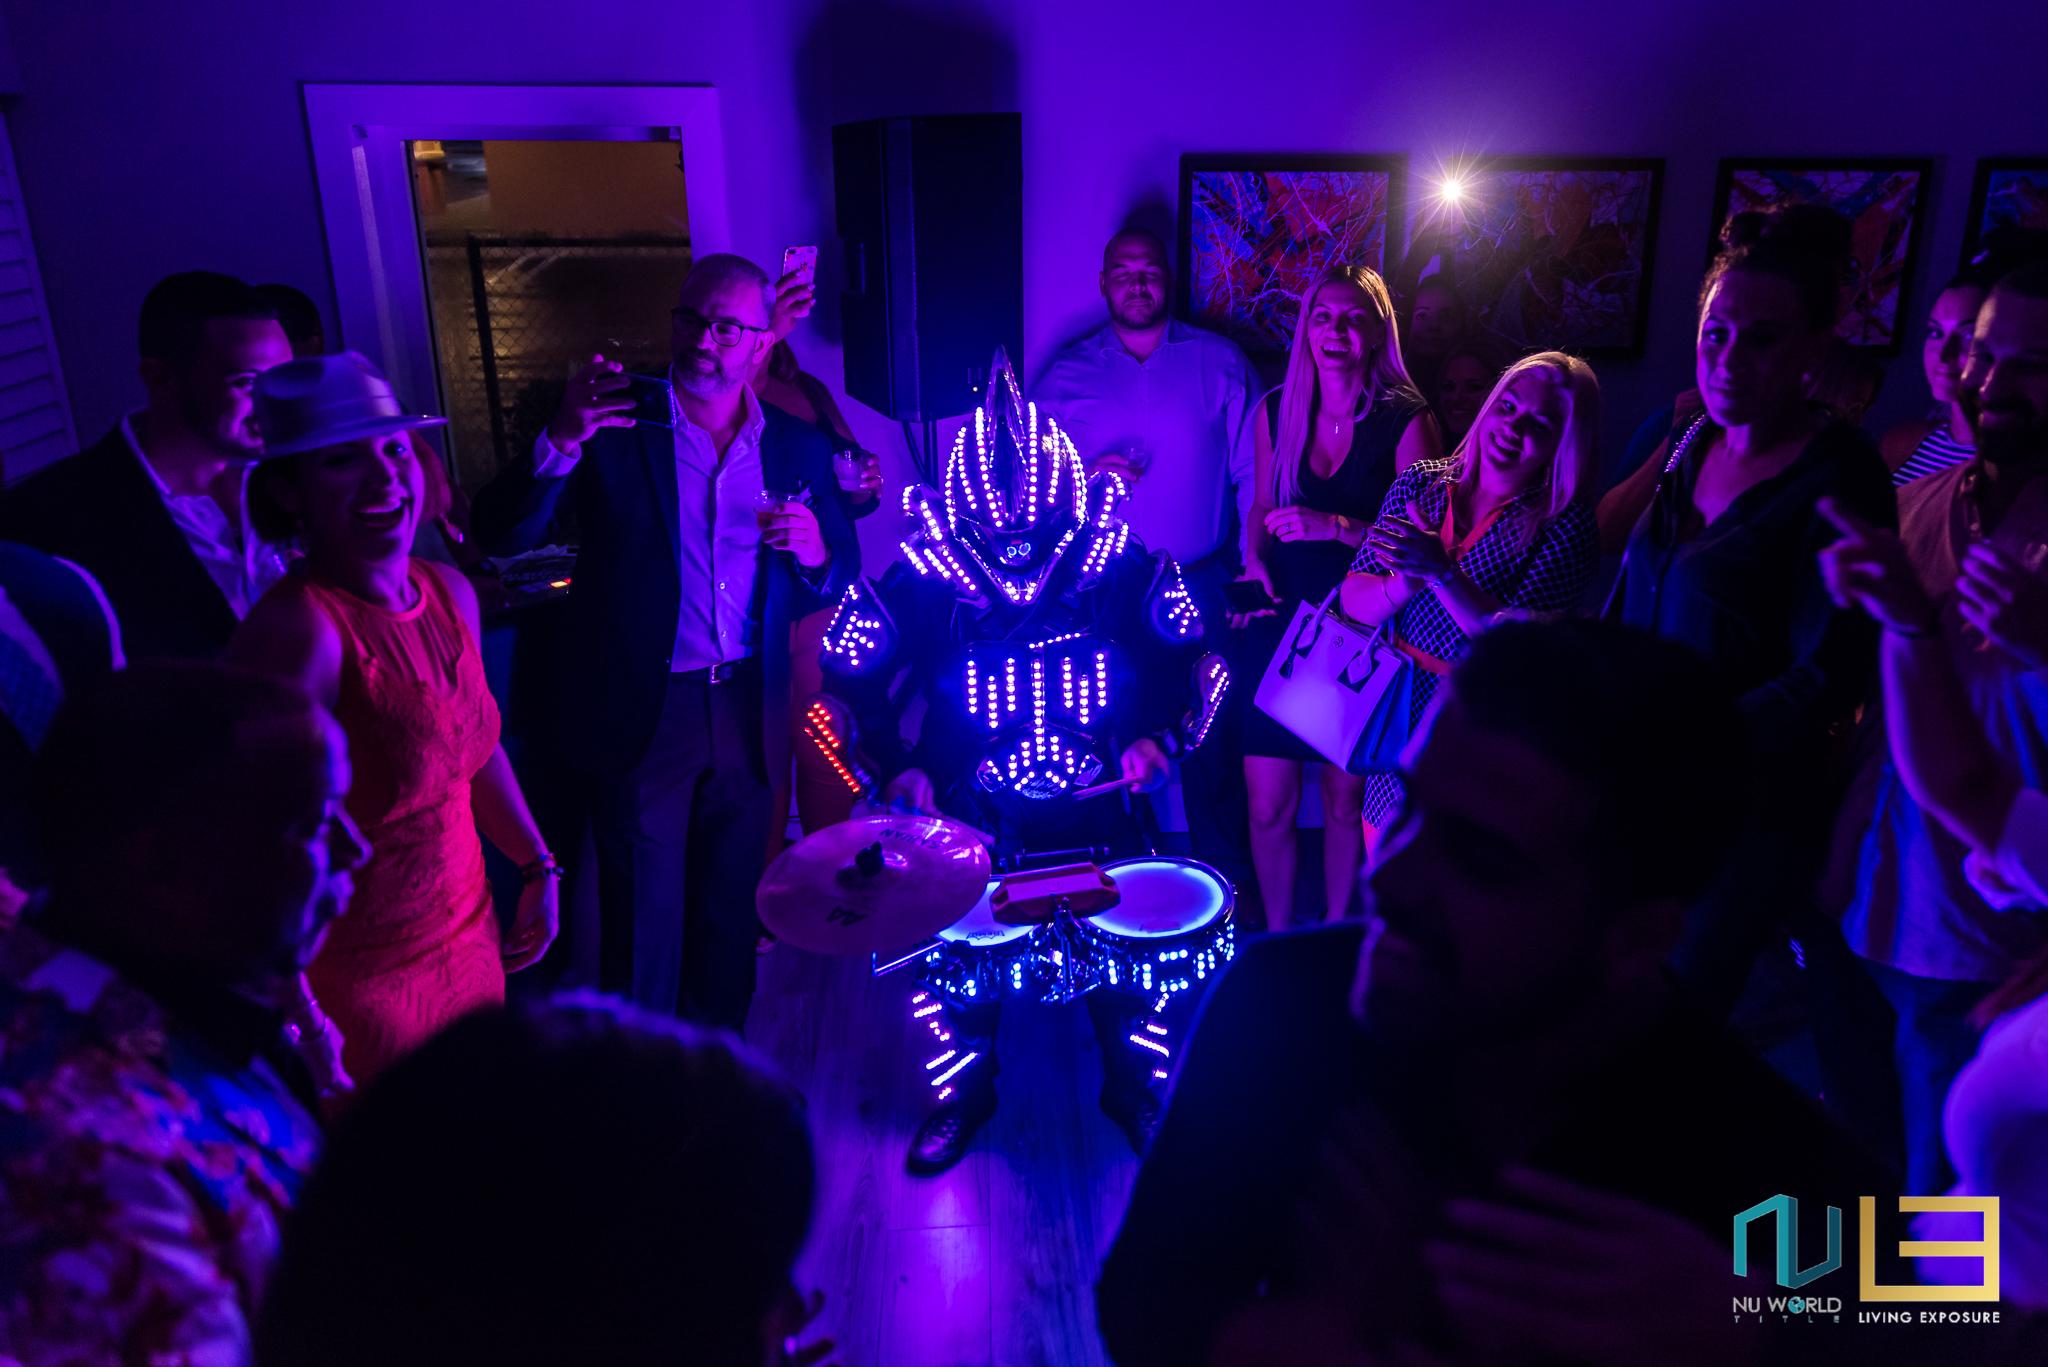 nuworldtitle miami livingexposure office opening-19.jpg